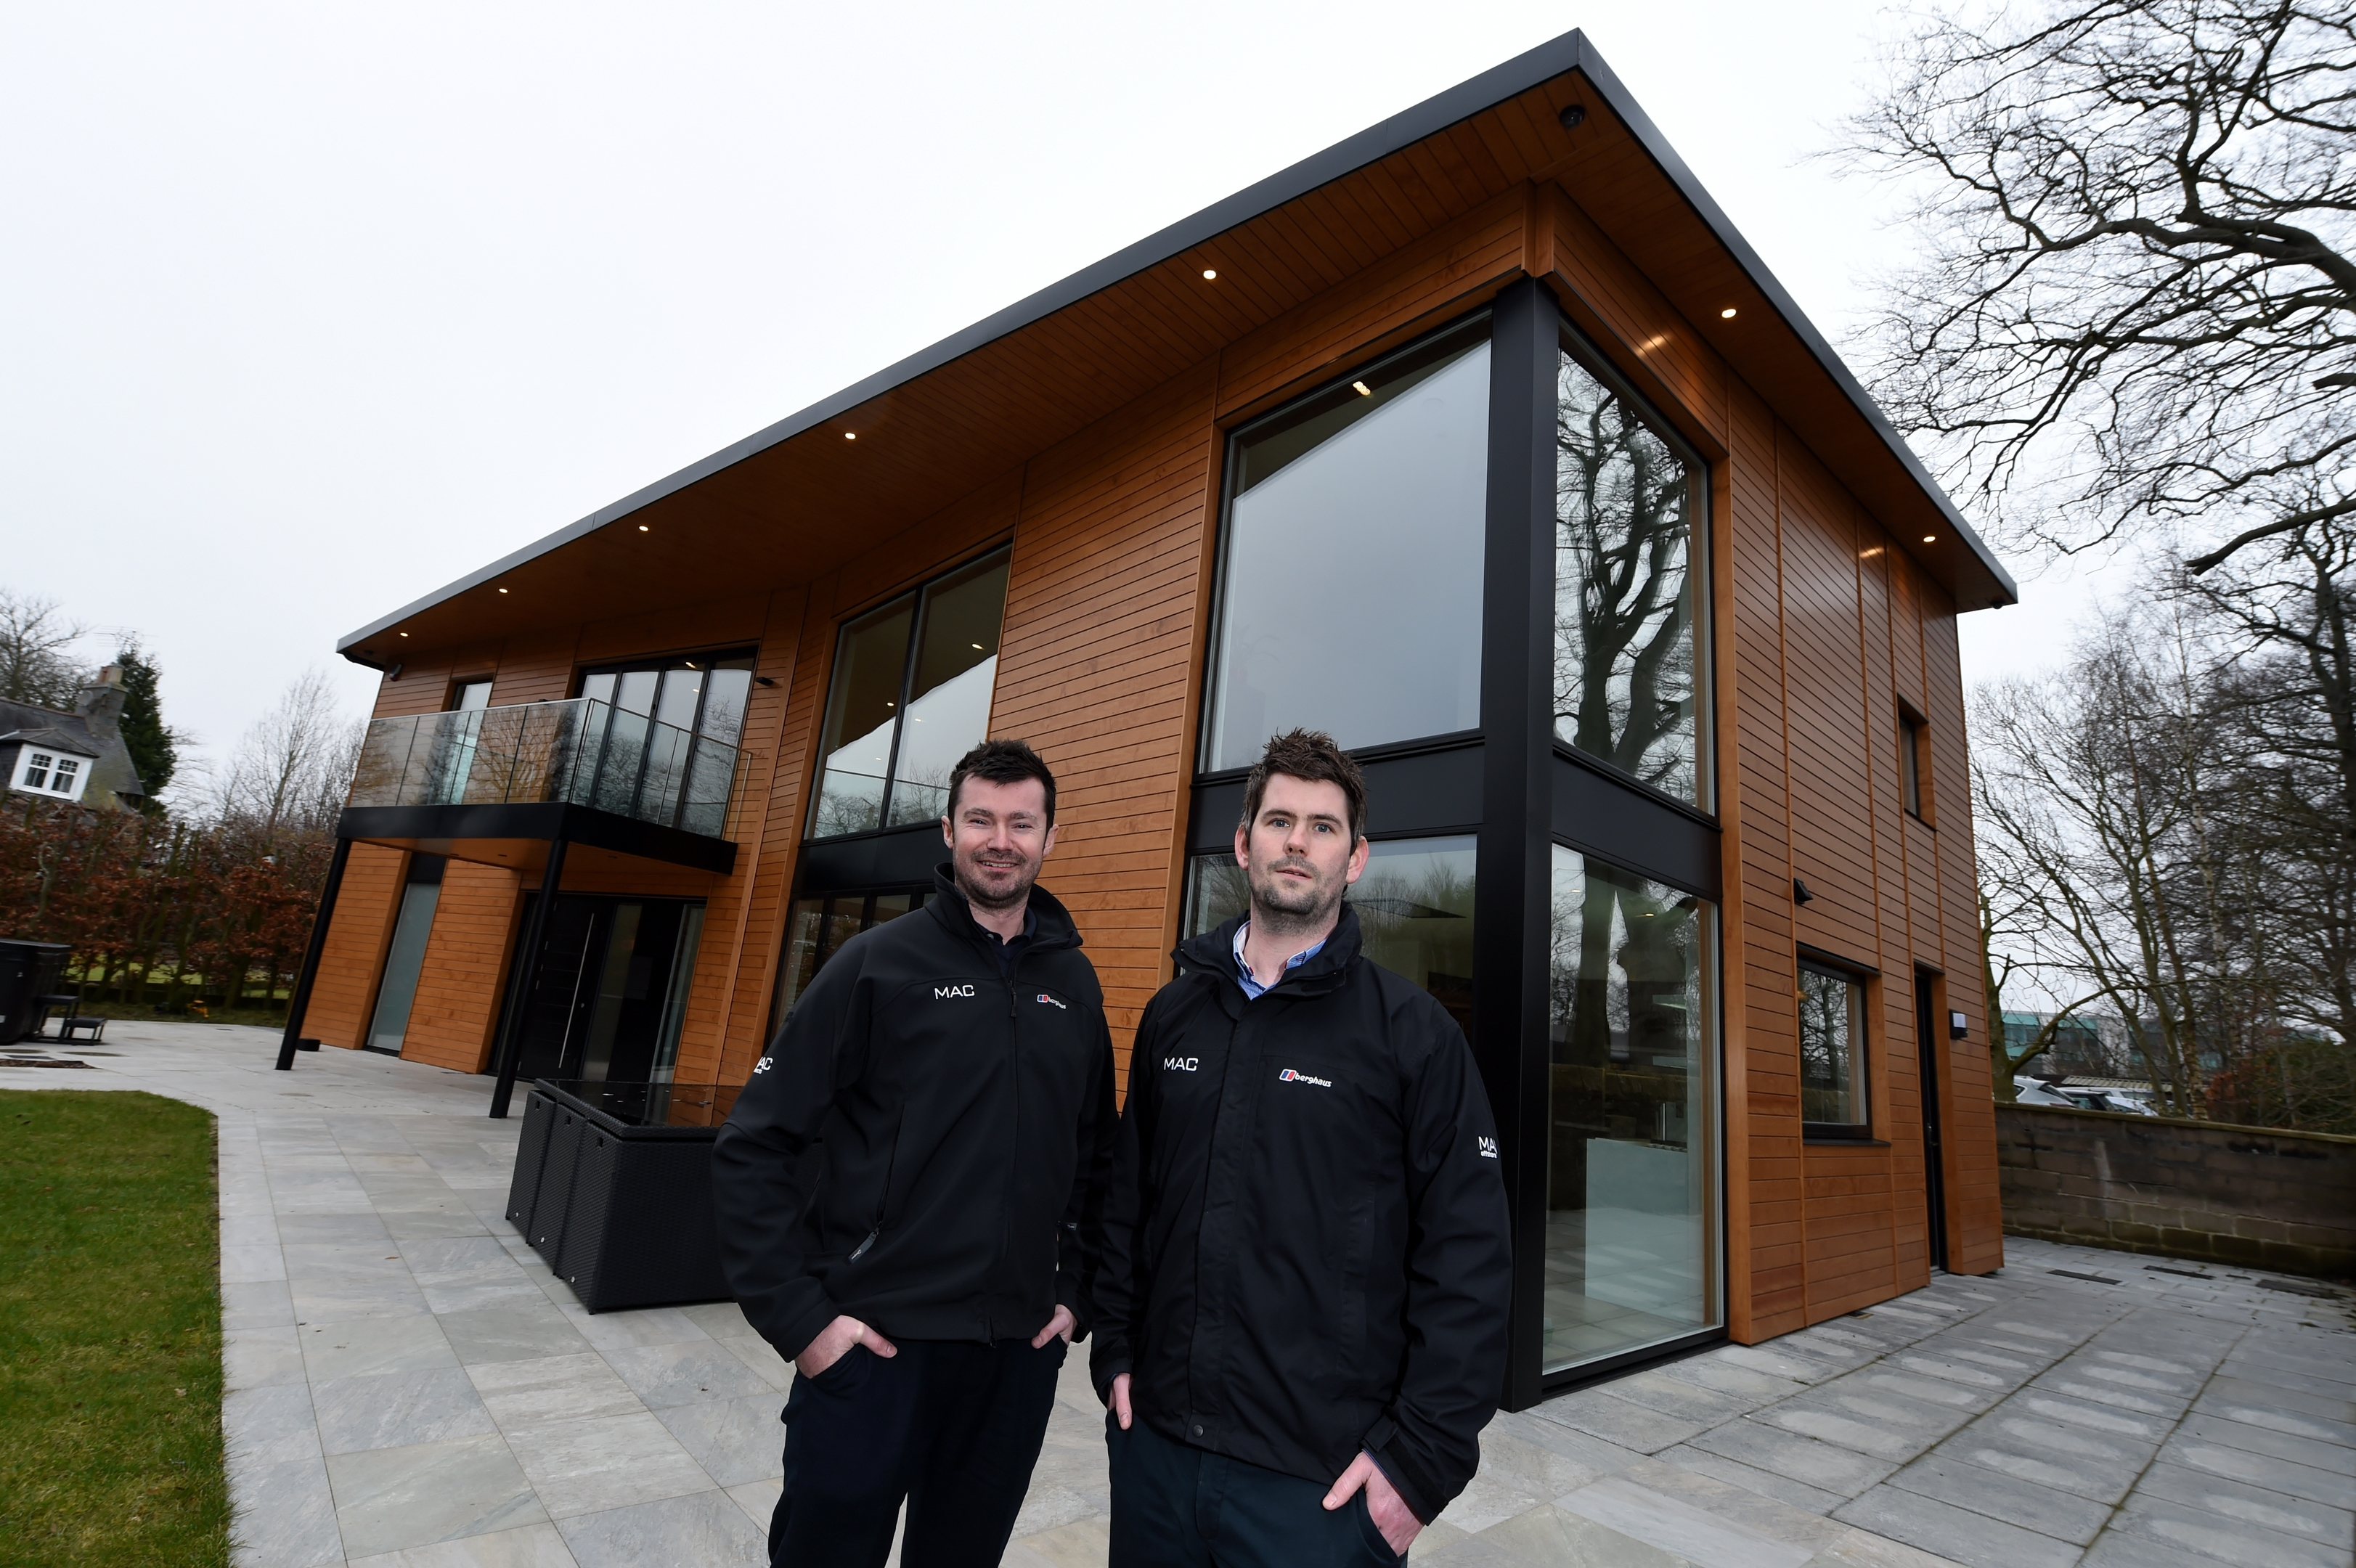 Architects Blair Milne and Jonathon Cheyne